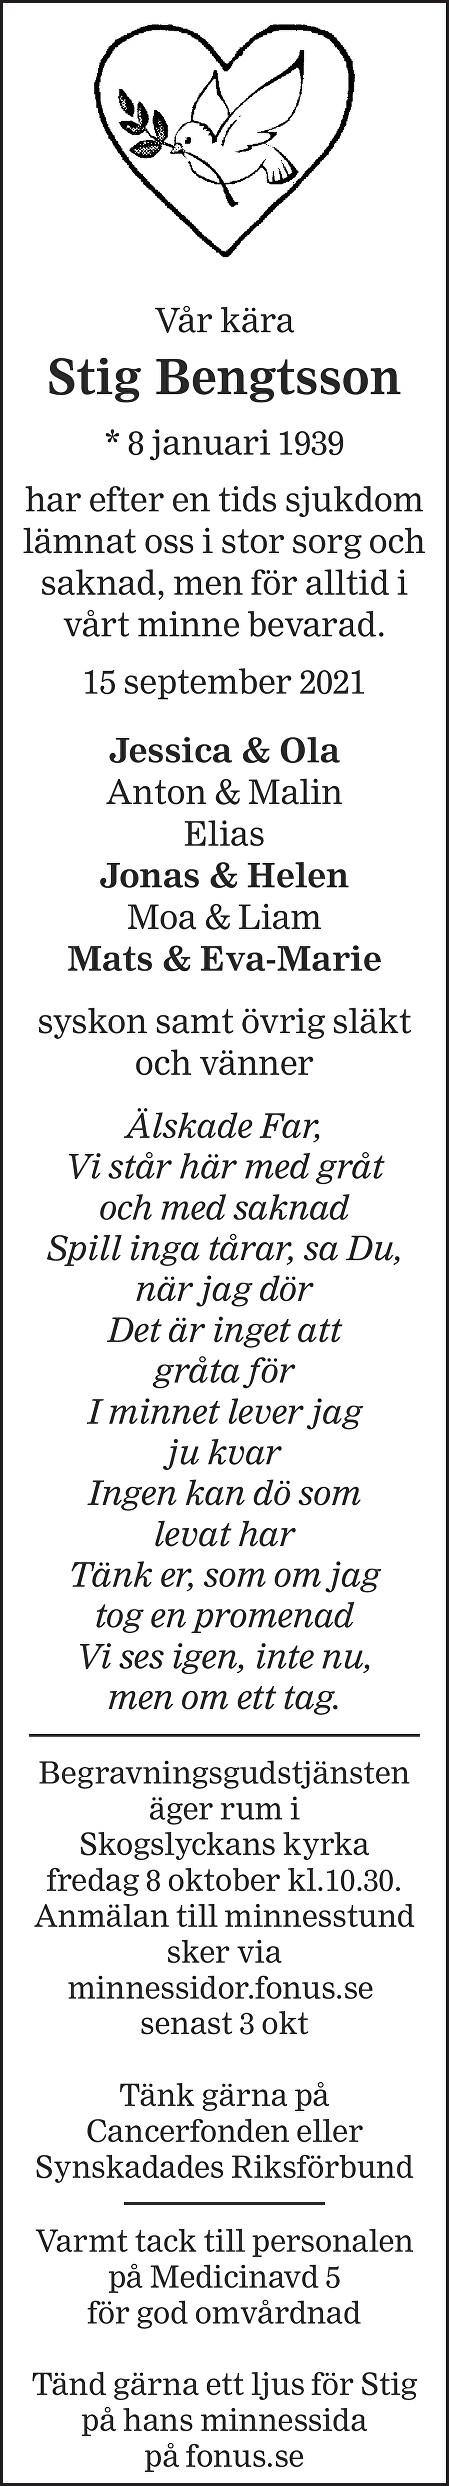 Stig Bengtsson Death notice